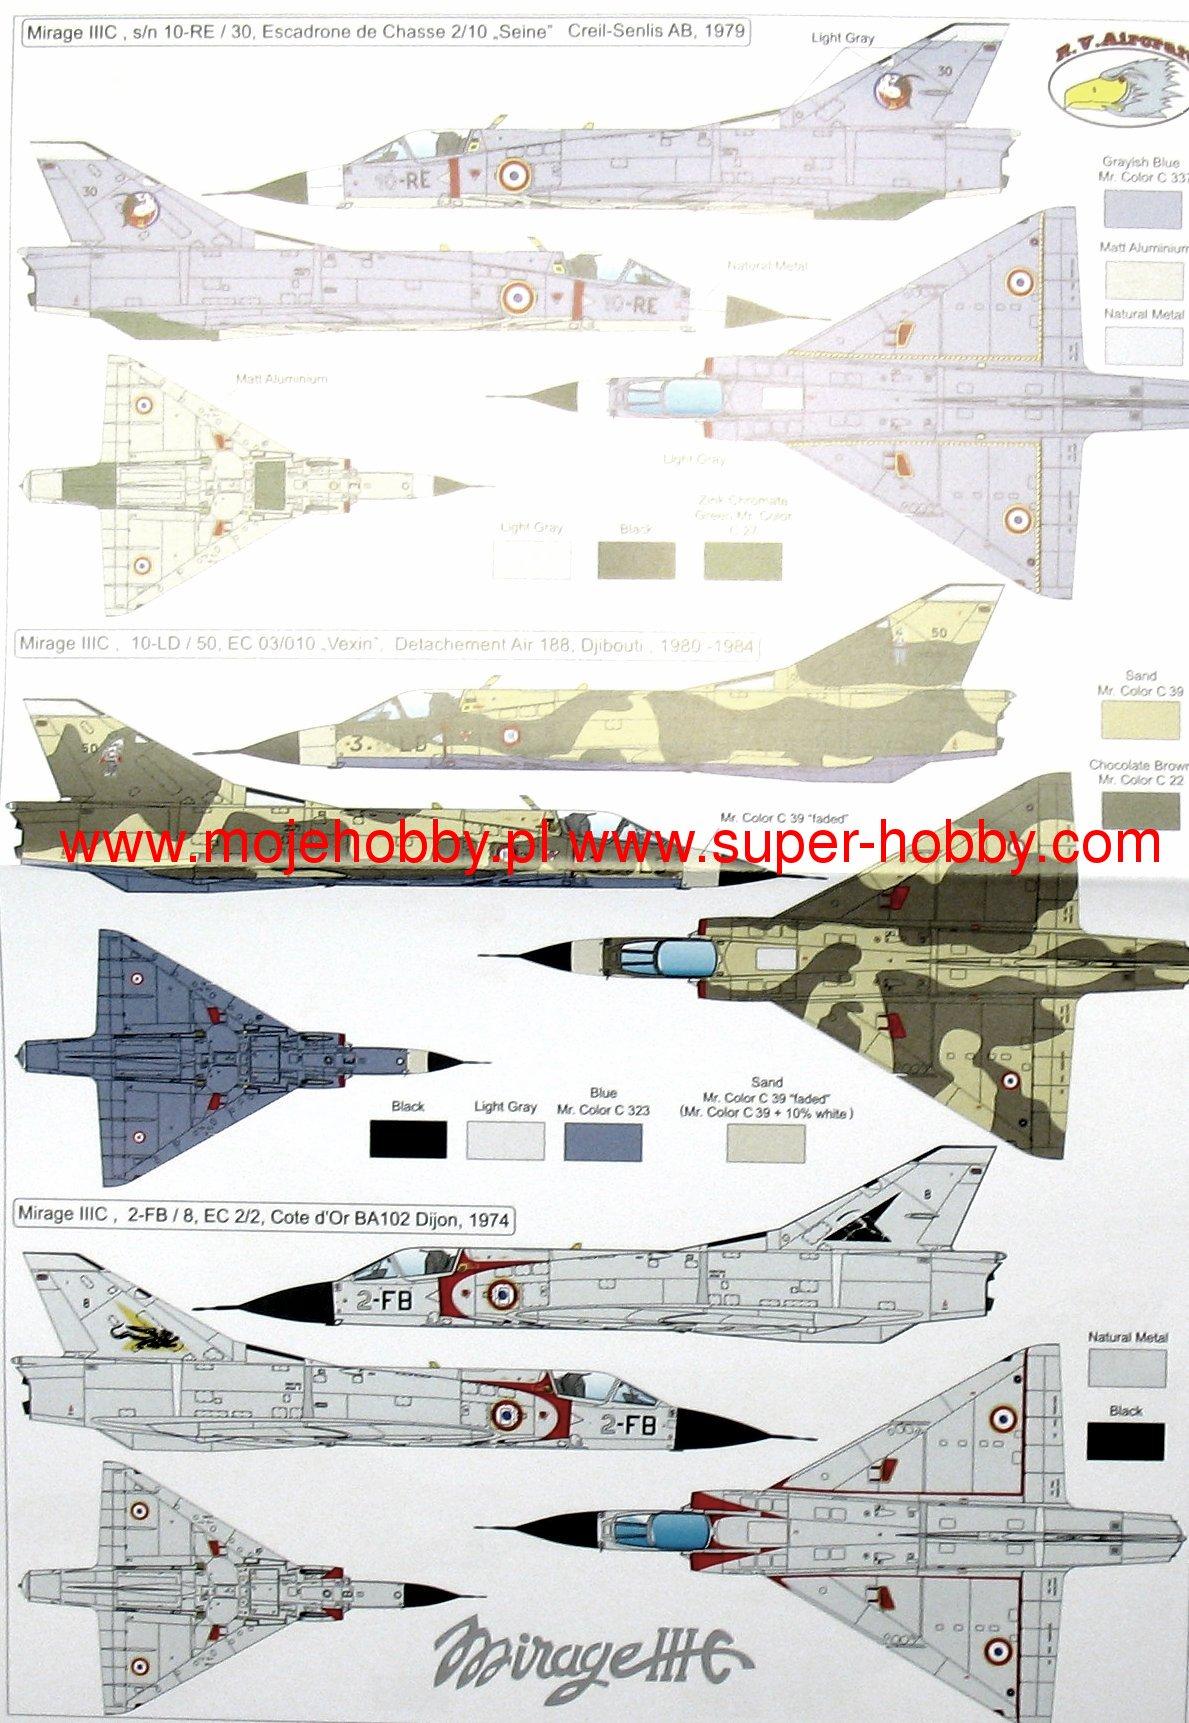 Mirage Iii Diagram Custom Wiring Mitsubishi Engine Cj R V Aircraft 72049 Rh Super Hobby Com 2001 Desert